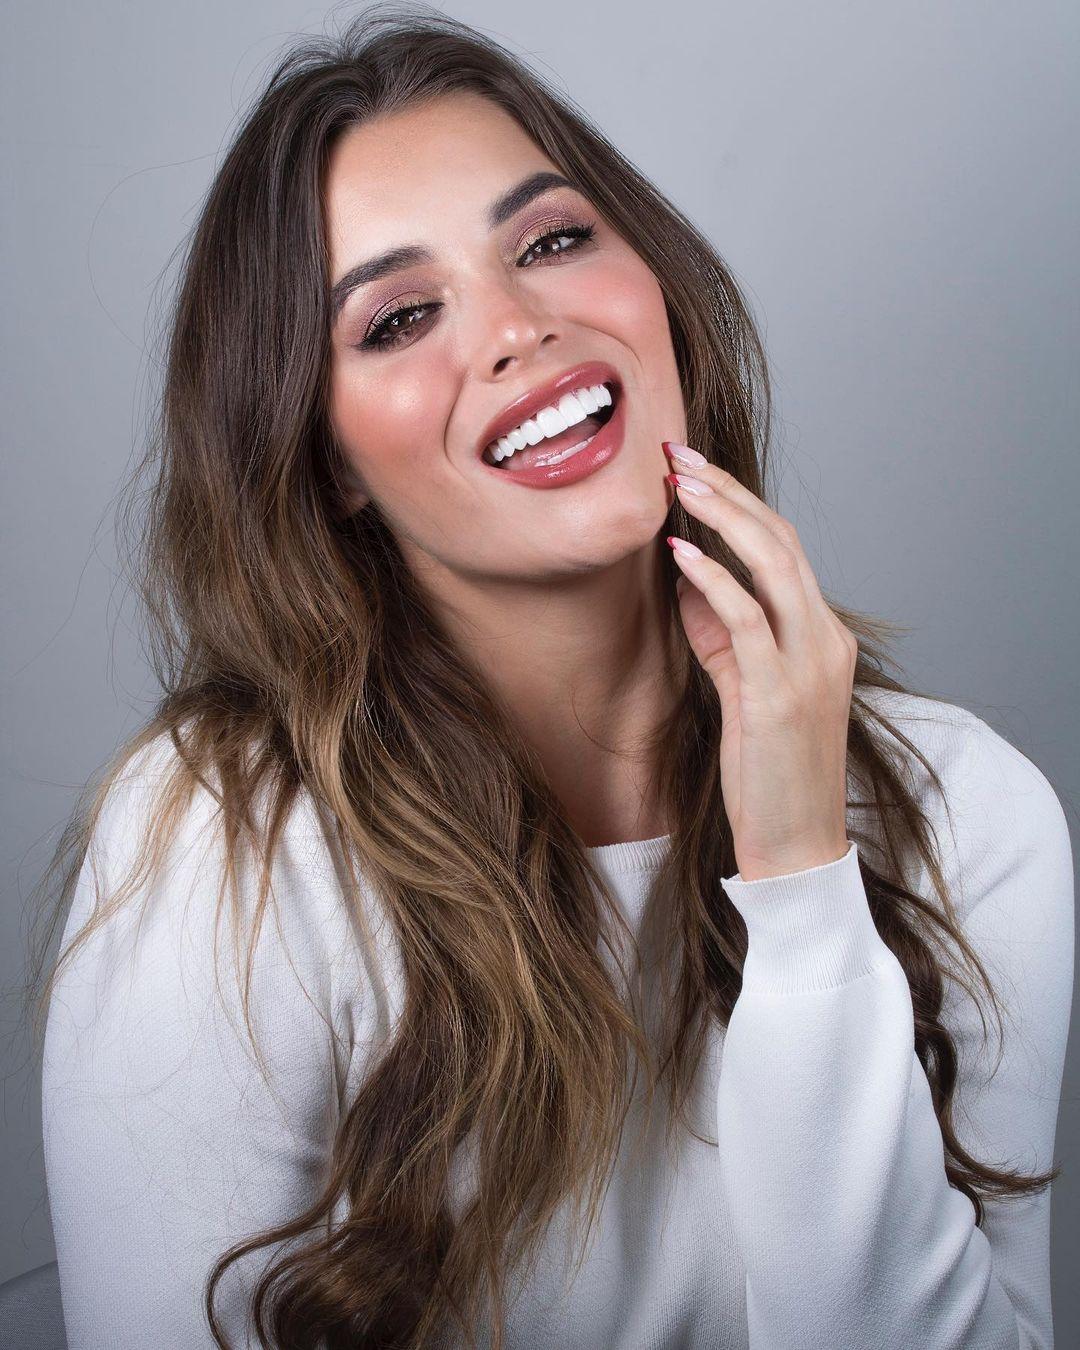 maria alejandra lopez perez, miss universe risaralda 2021/reyna hispanoamericana 2013/miss caraibes hibiscus 2014/miss colombia mundo 2015. 23242321